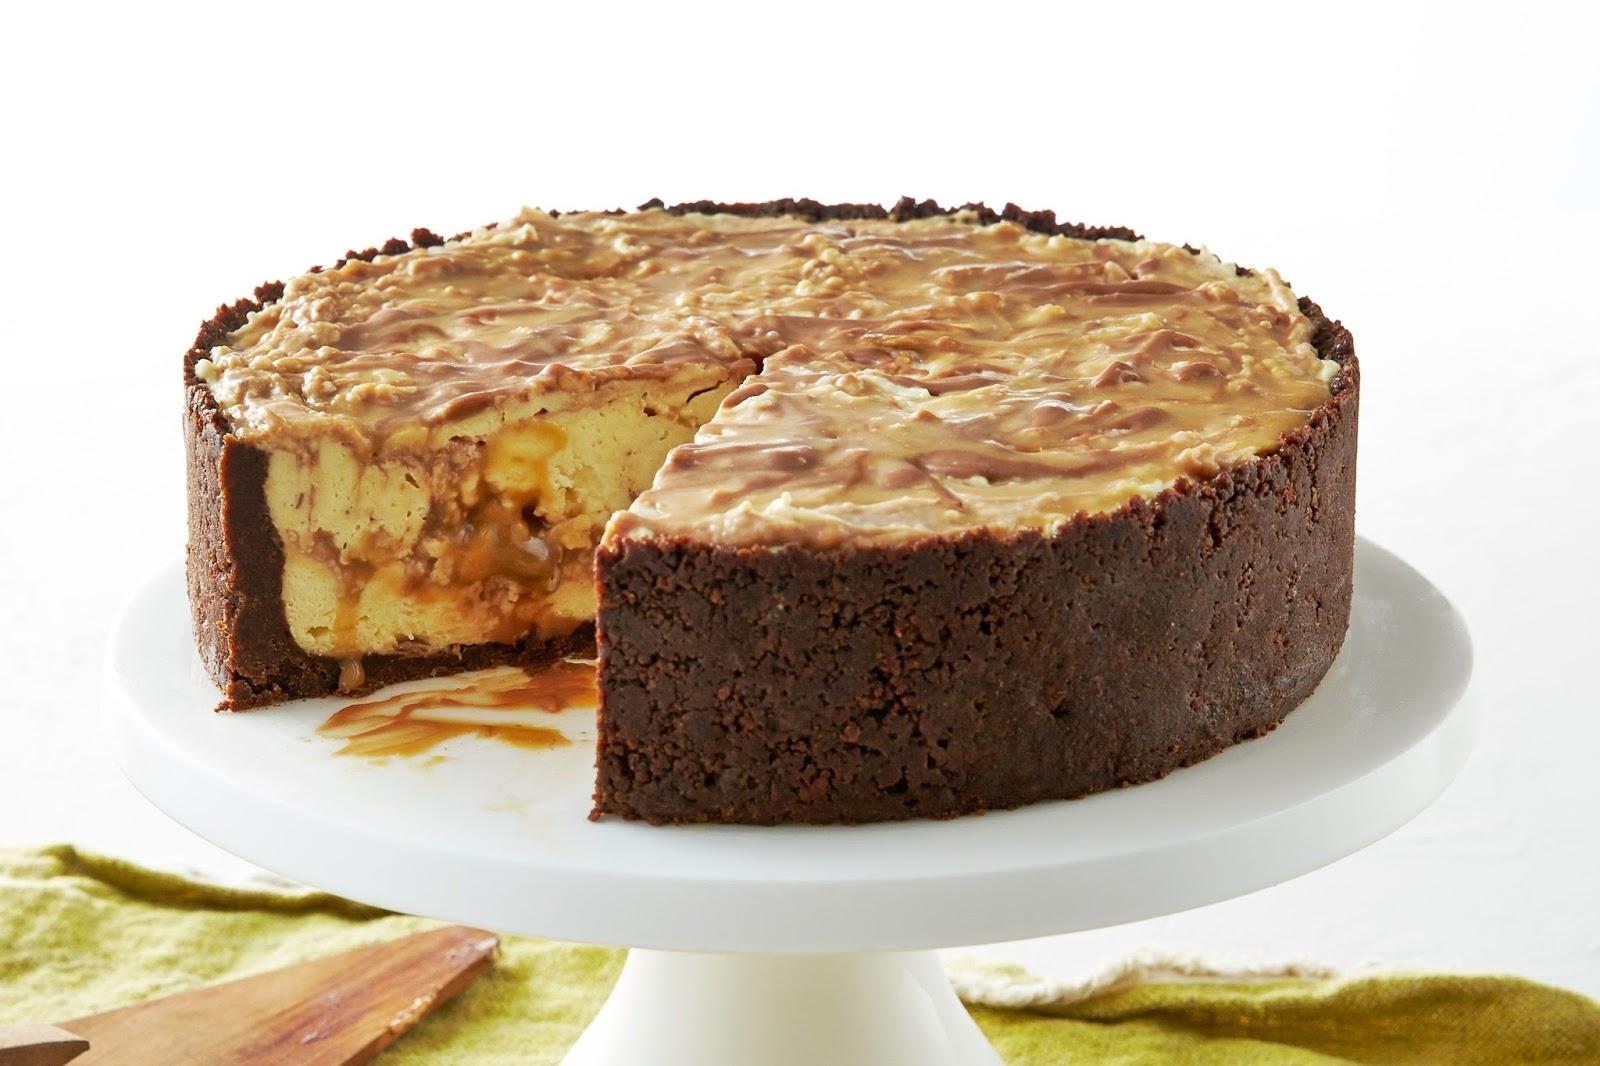 Cake Recipes In Pdf: Cheesecake De Barritas Mars